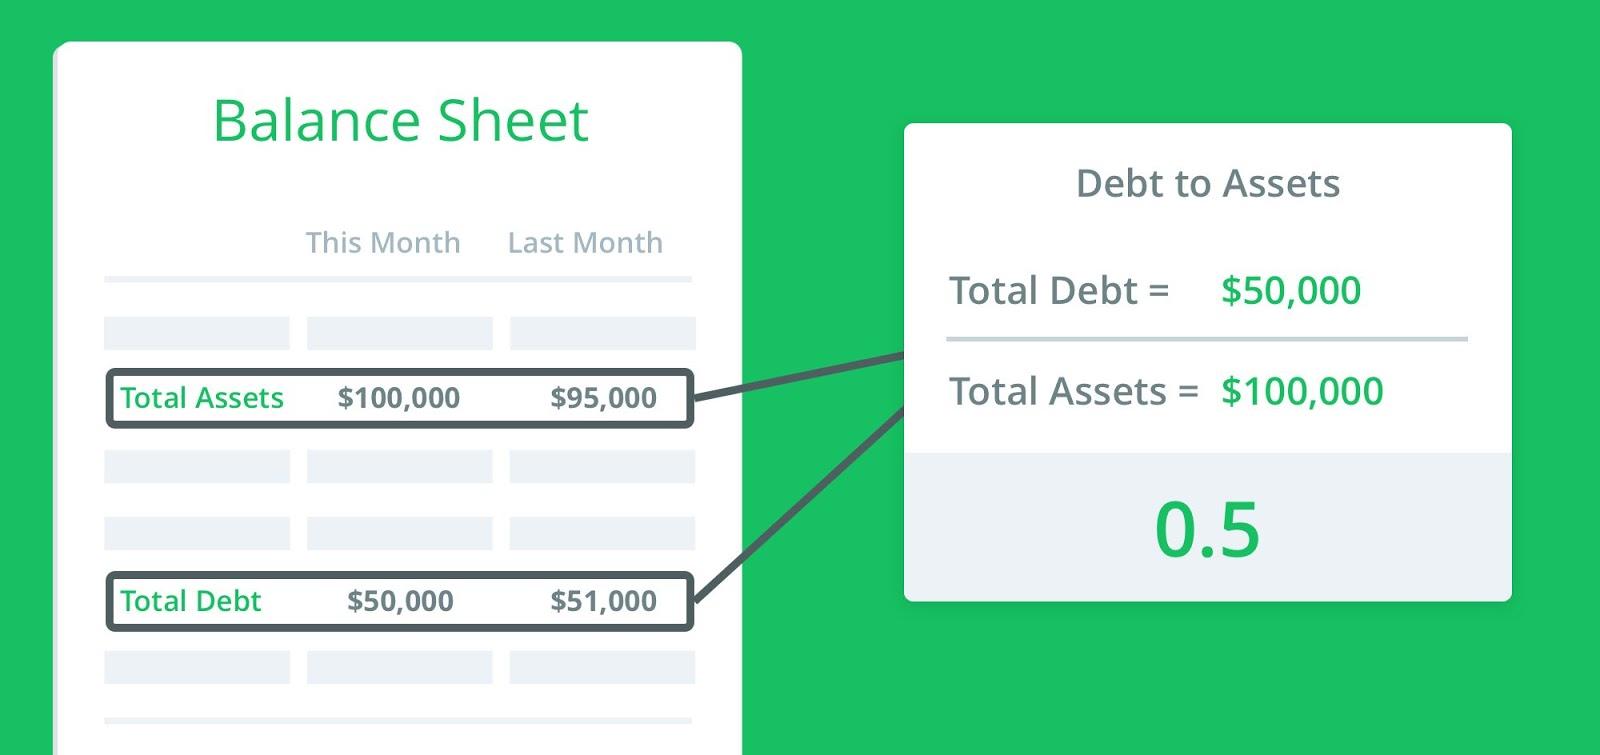 debt-to-assets-raio-example